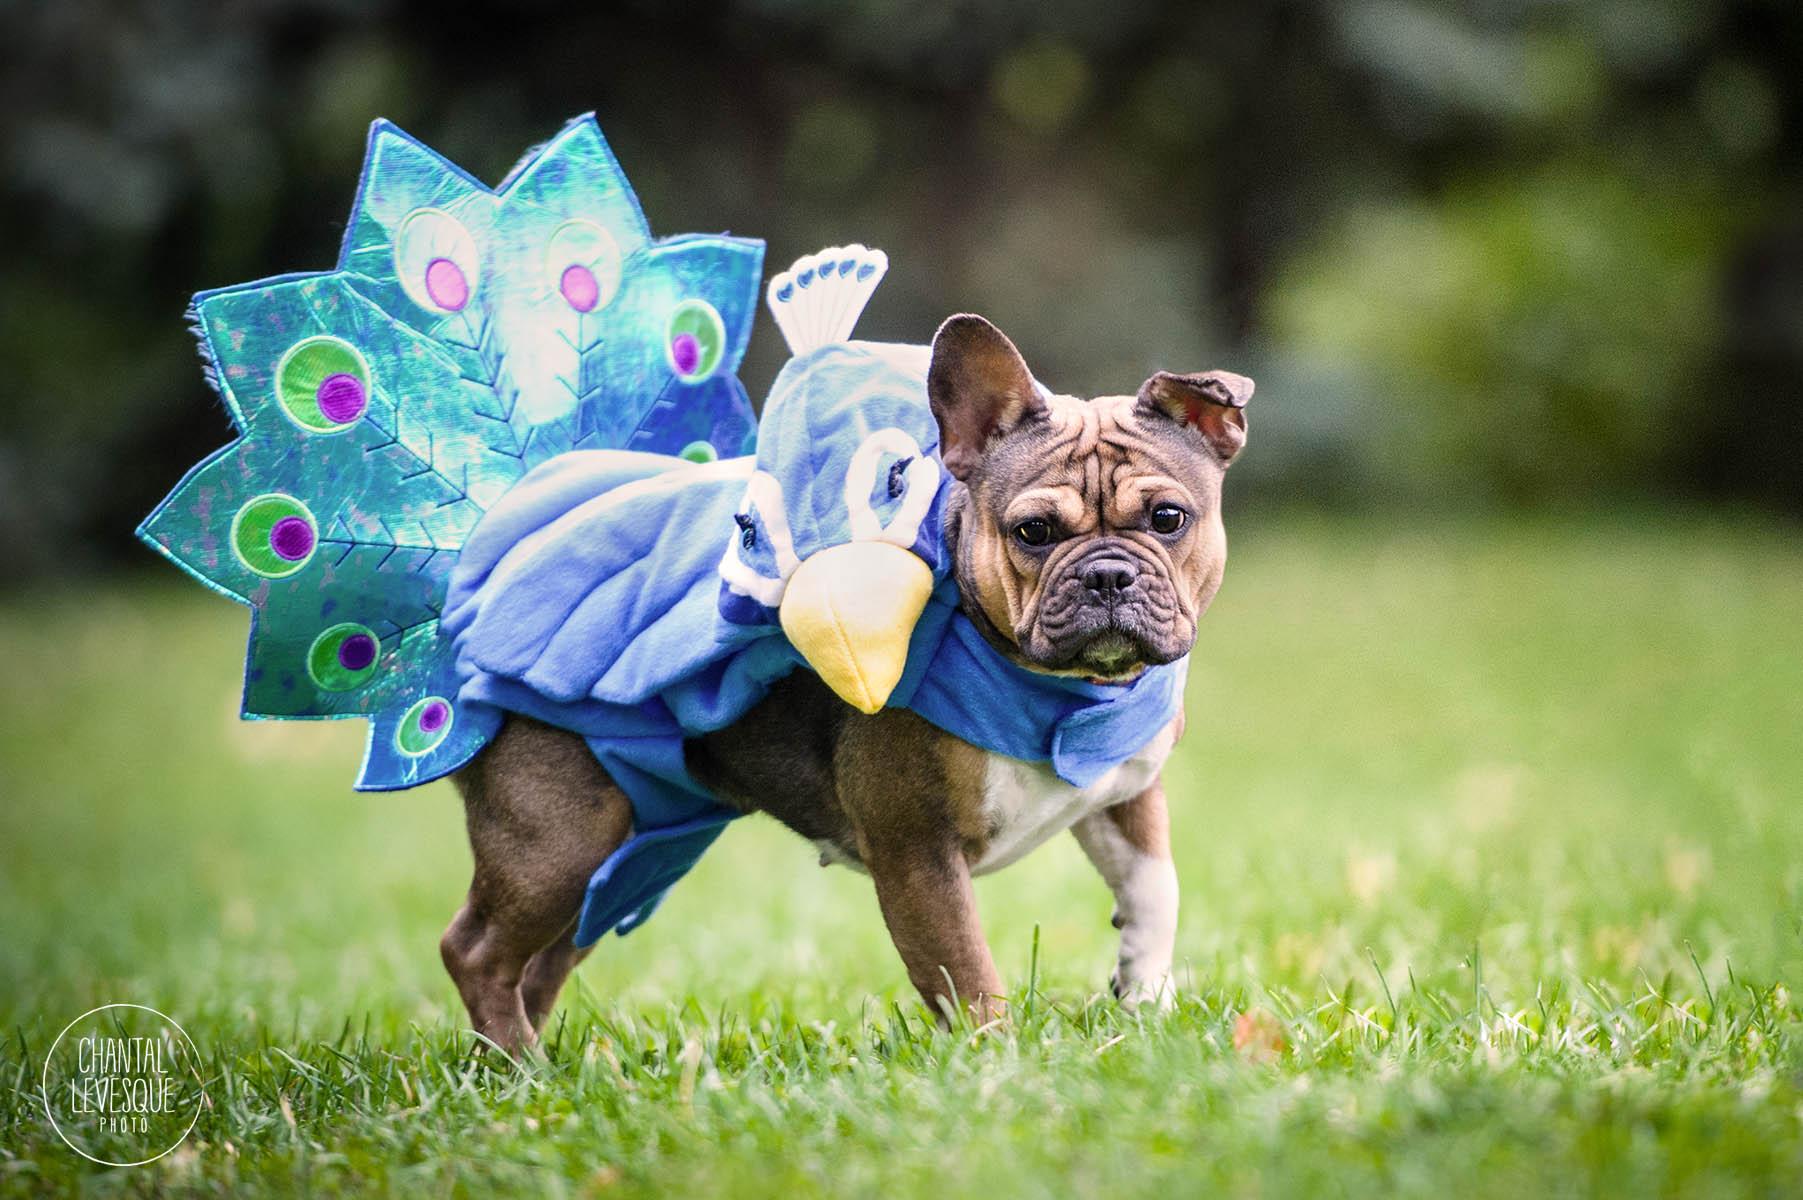 french-bulldog-bird-costume-halloween.jpg